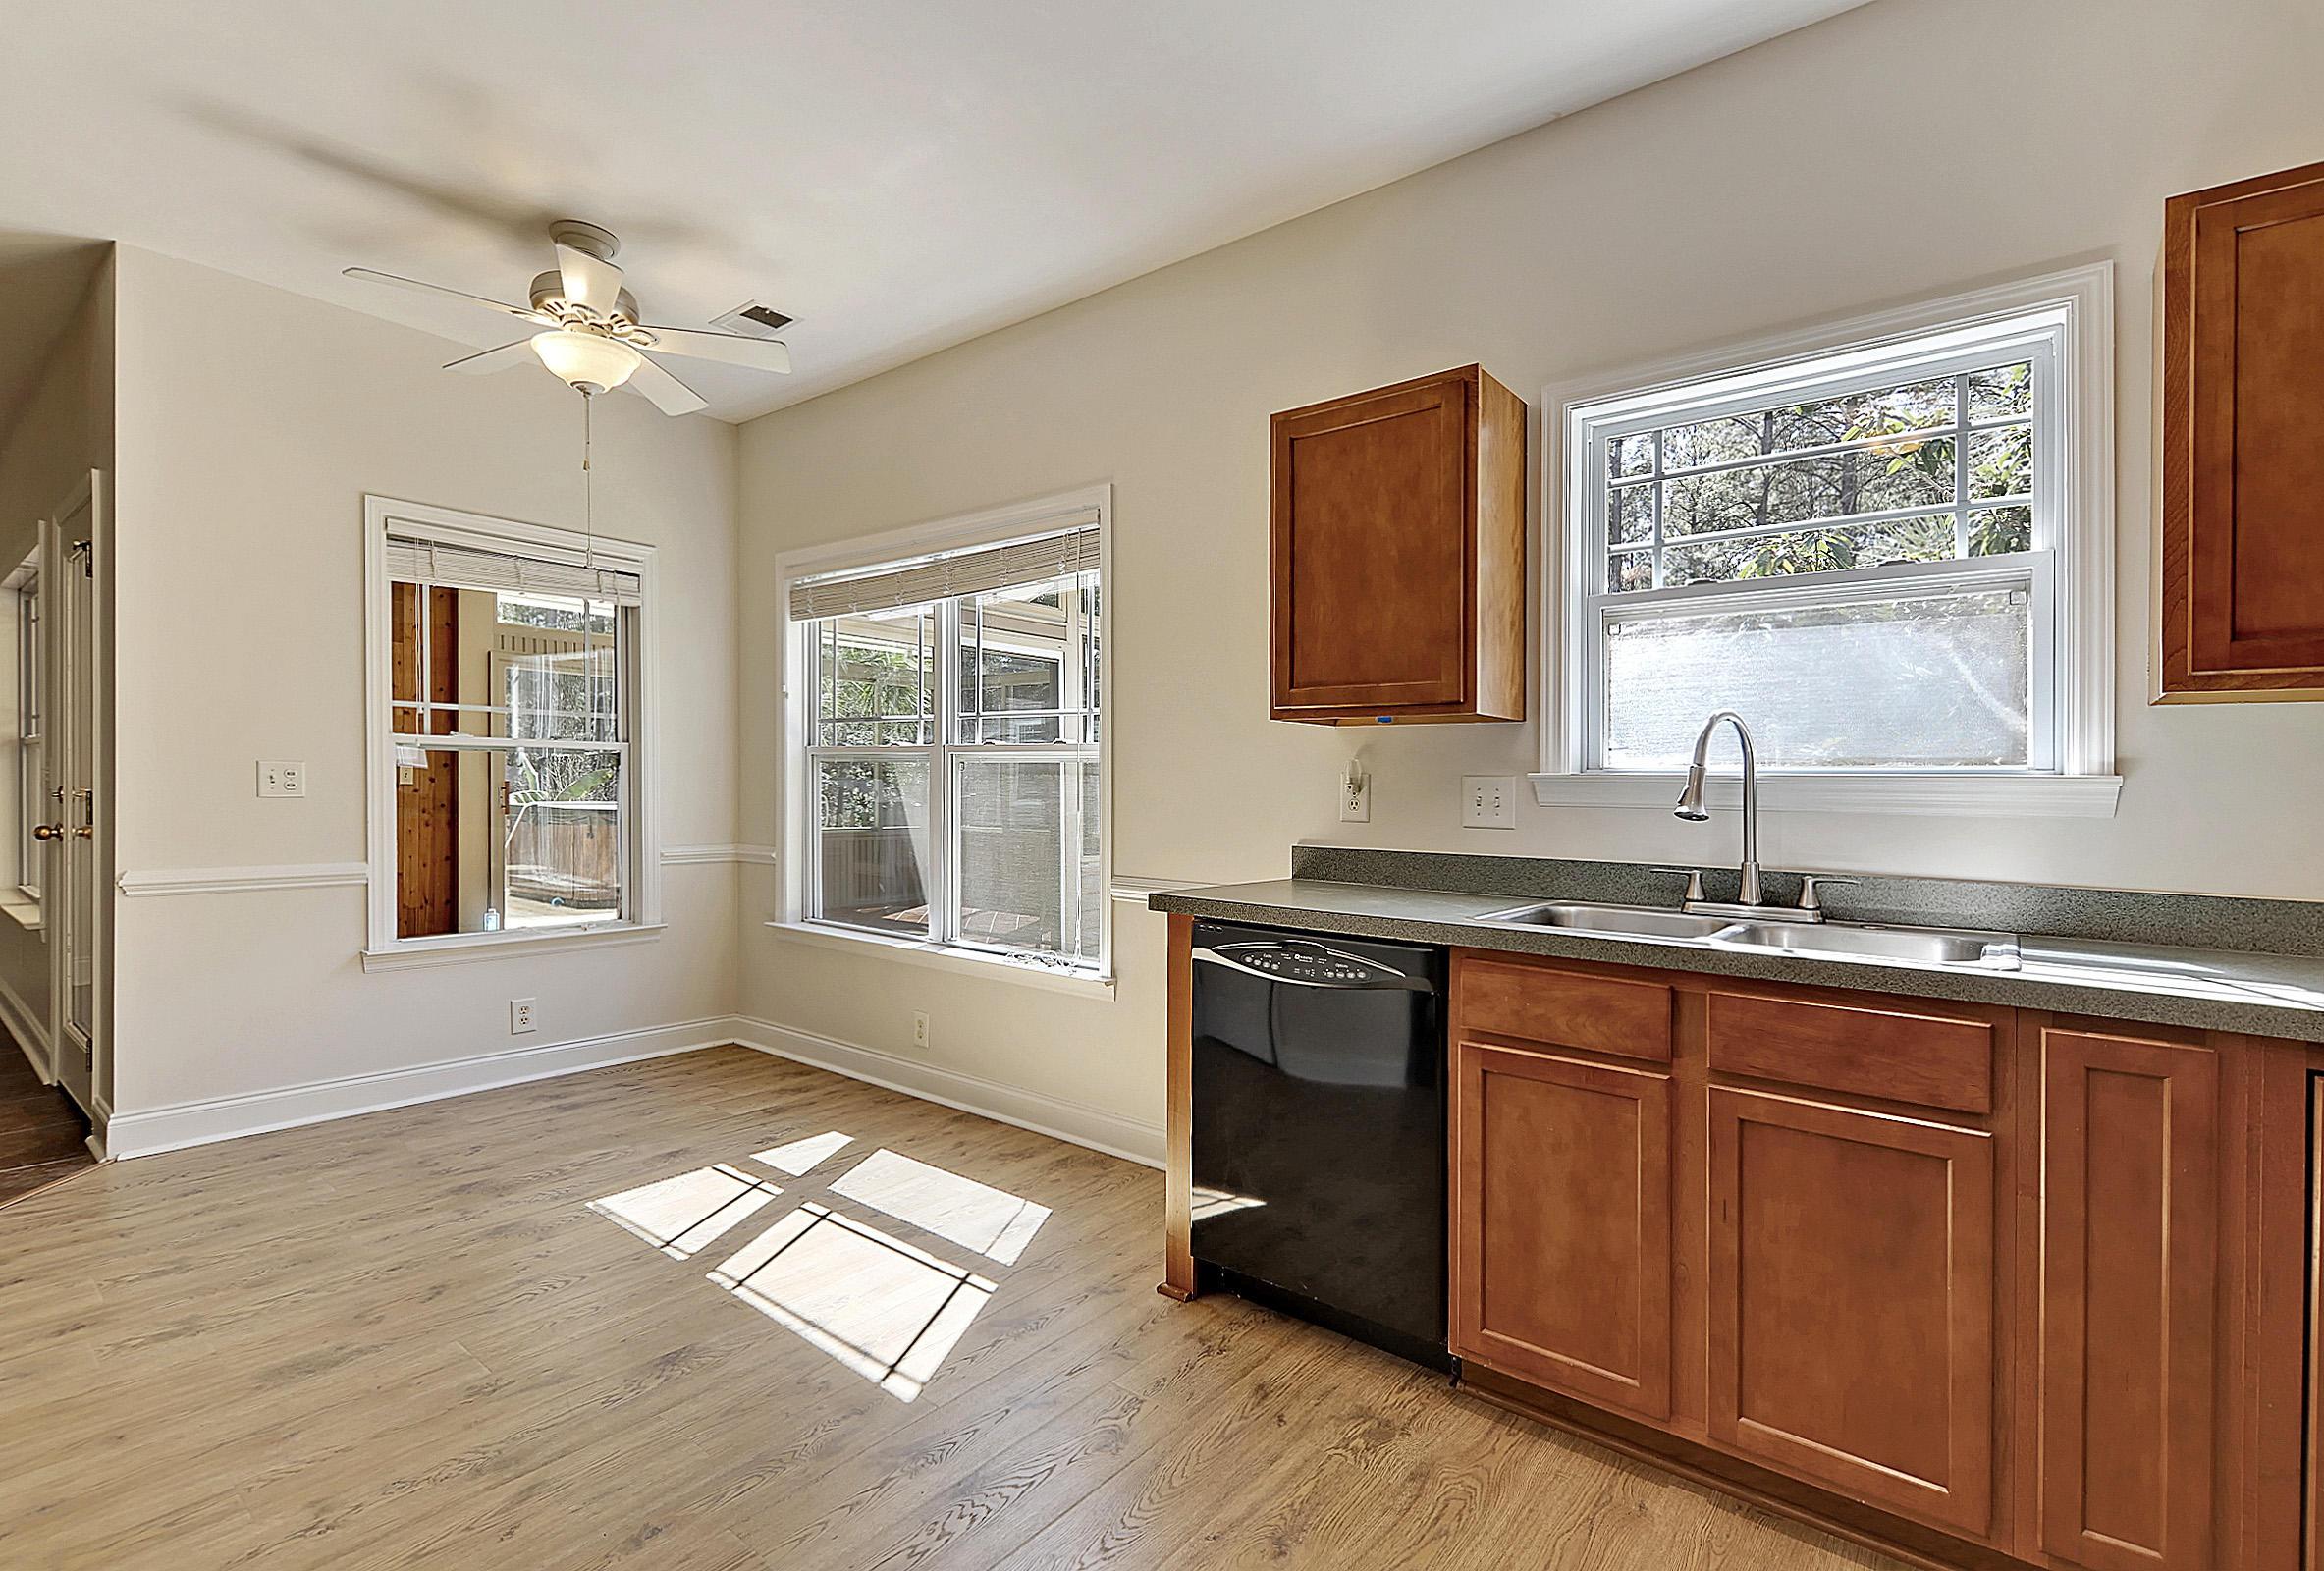 Edenvale Homes For Sale - 3113 Edenvale, Johns Island, SC - 26